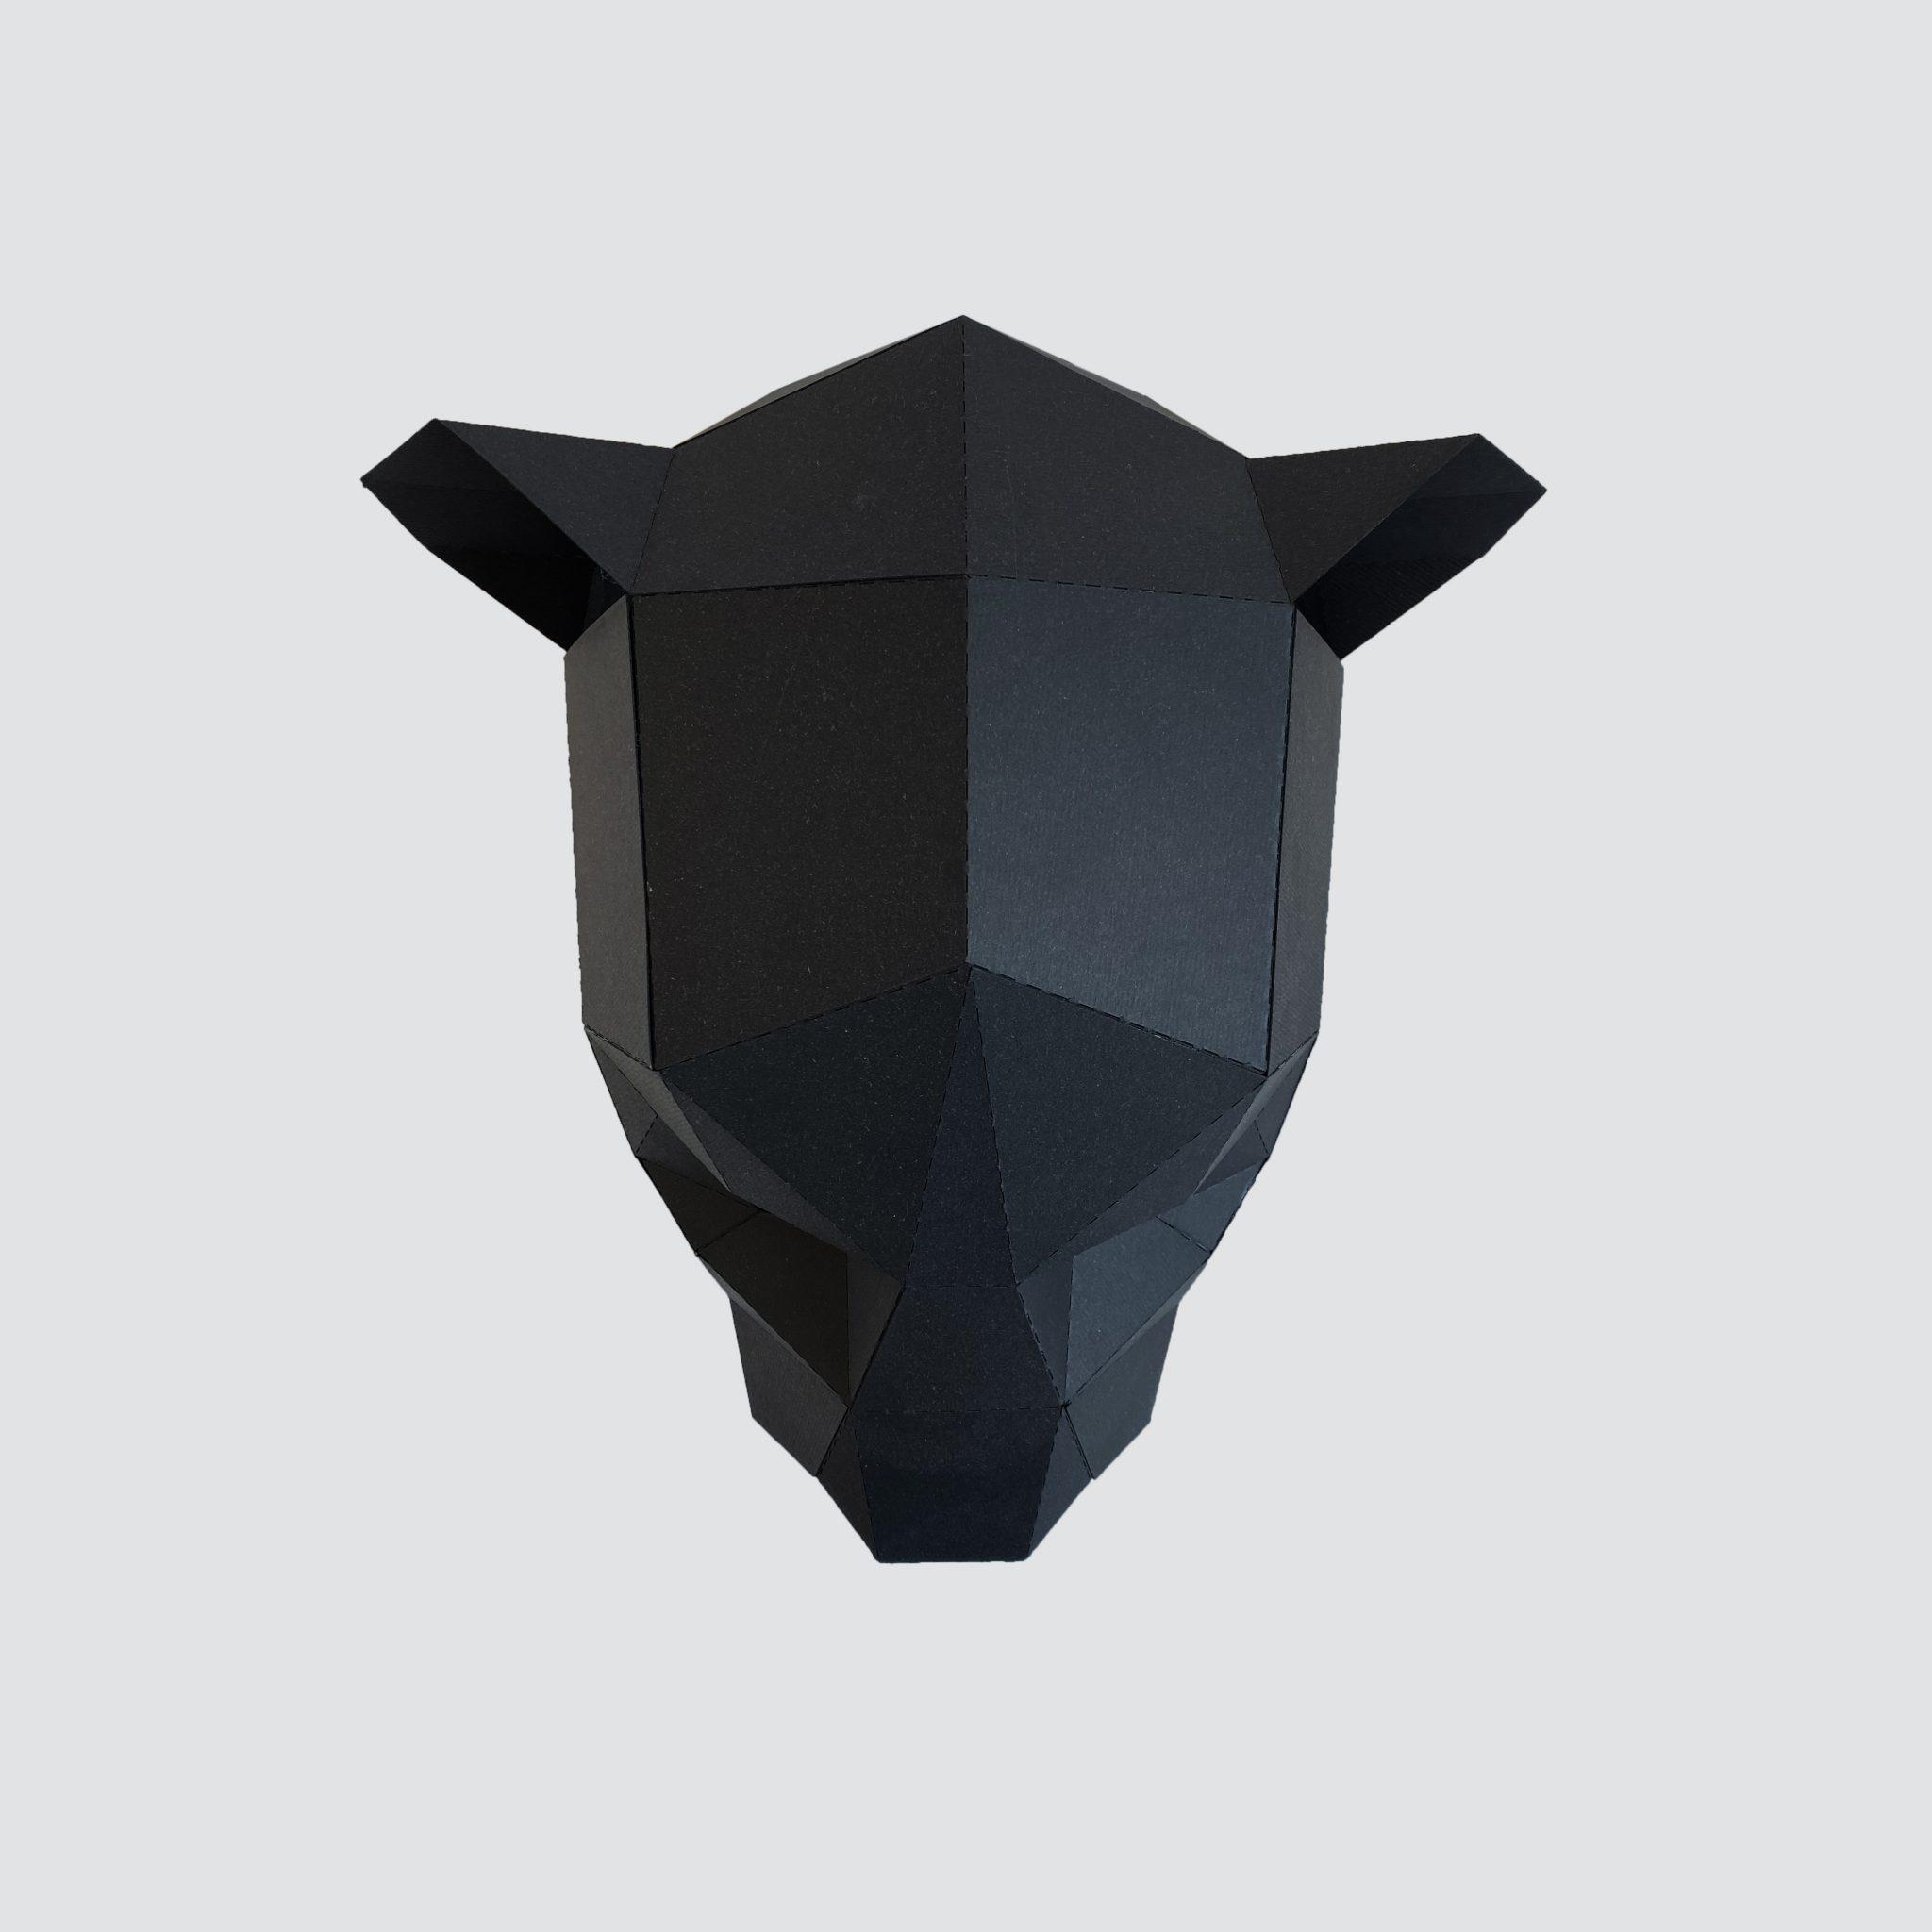 máscara corte láser cartulina 2